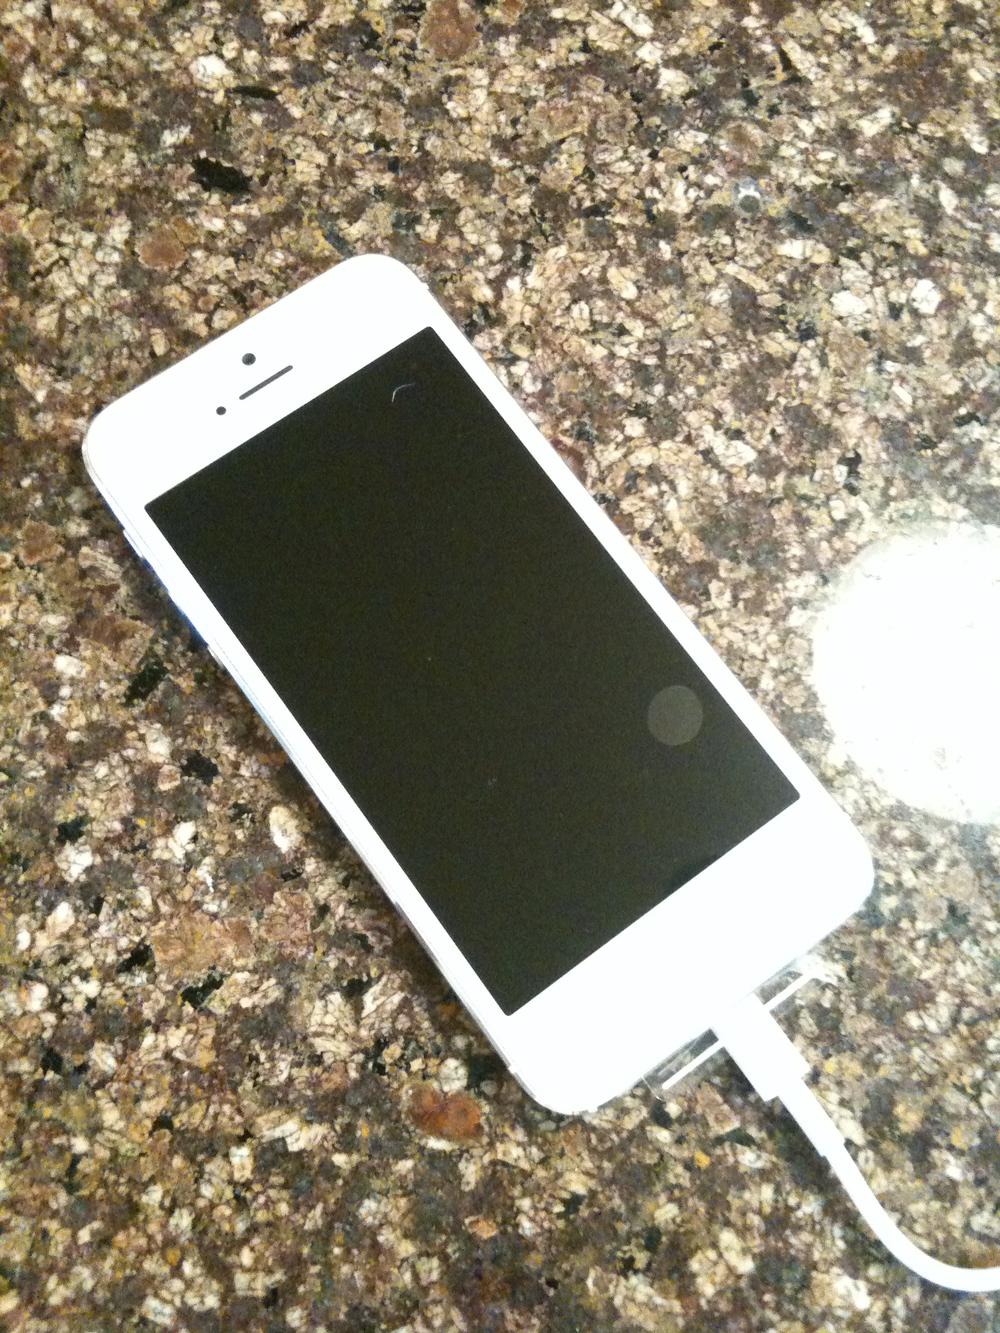 mom's new iphone!